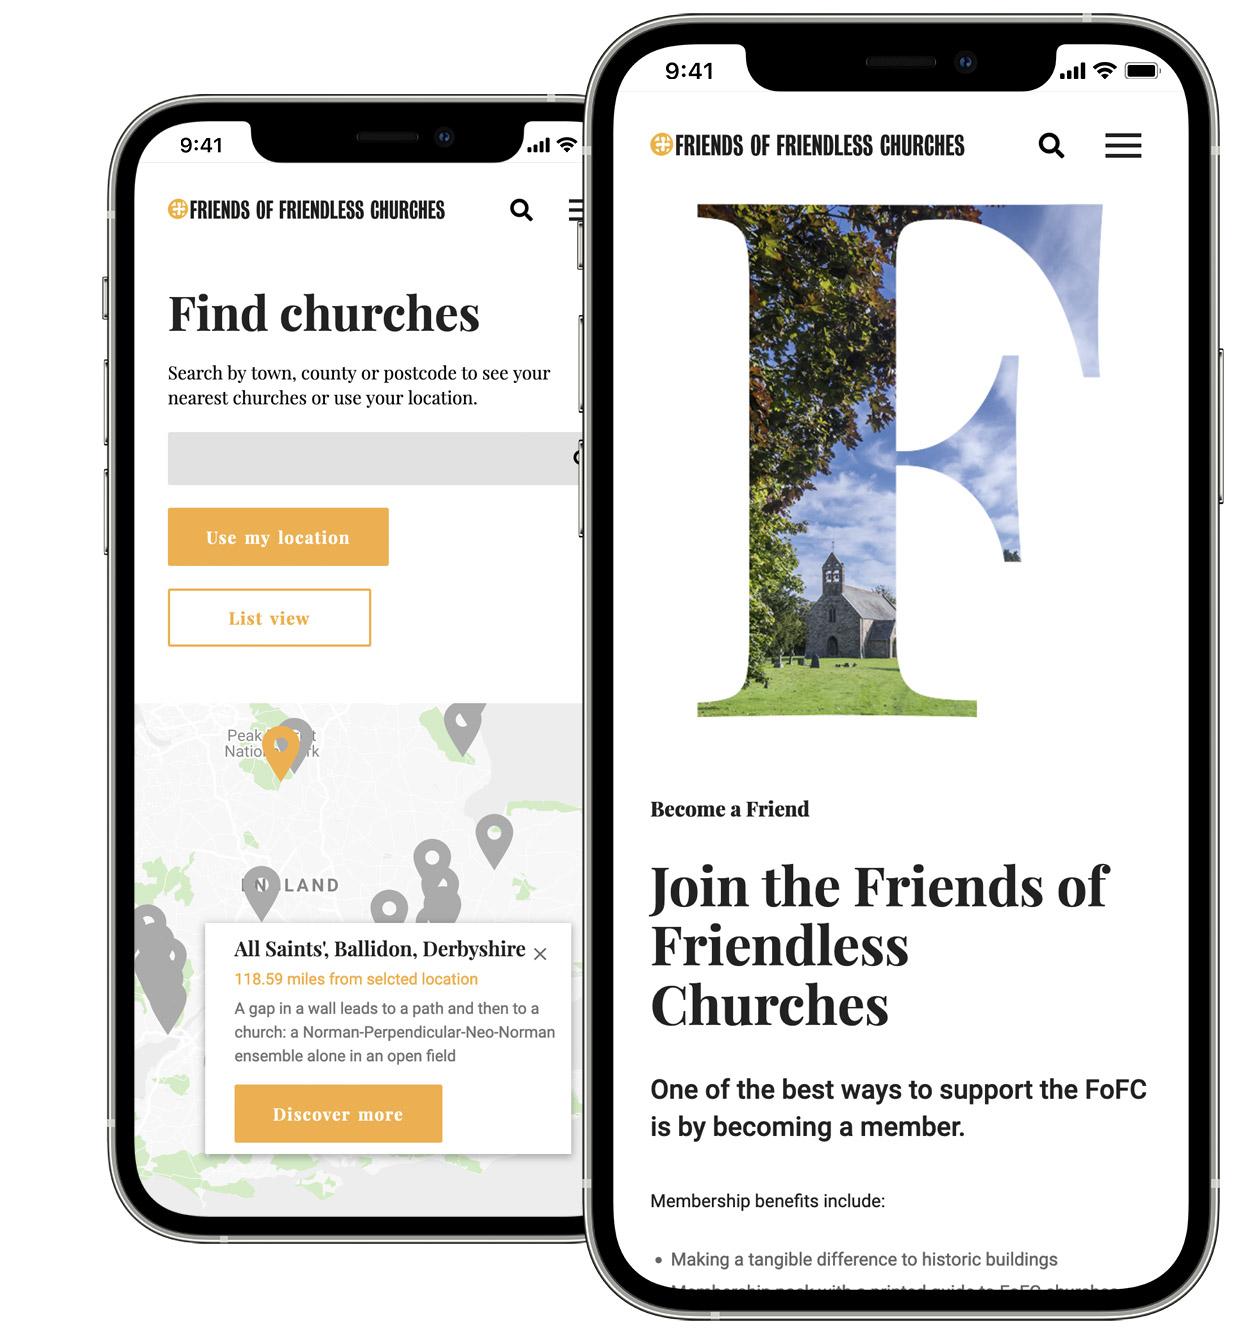 Friends of Friendless Churches Responsive Website Design